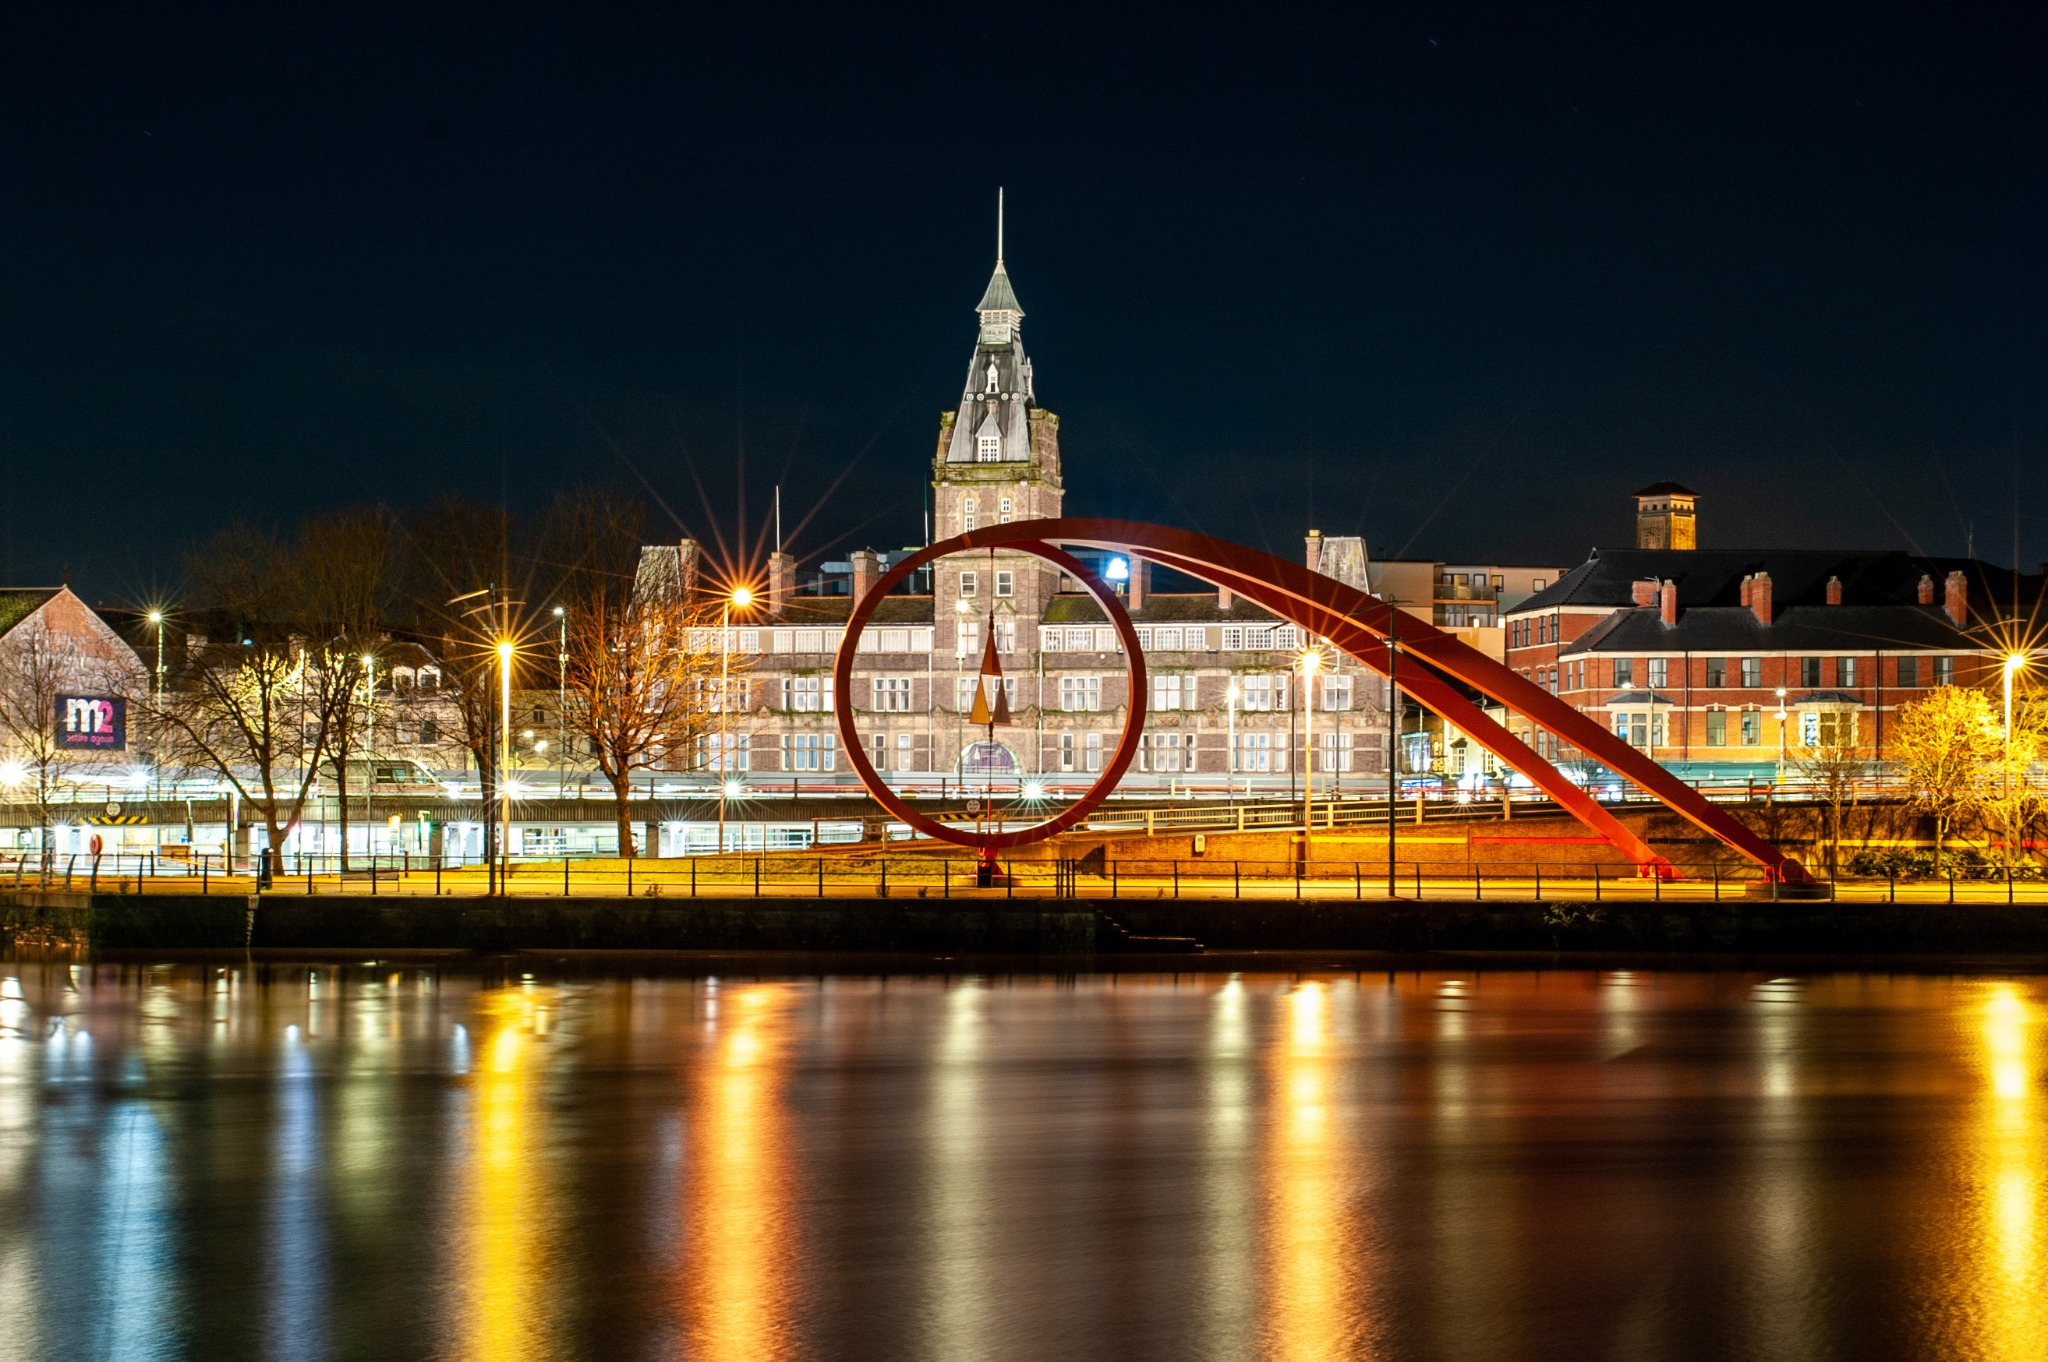 Newport, Wales cityscape at nighttime.